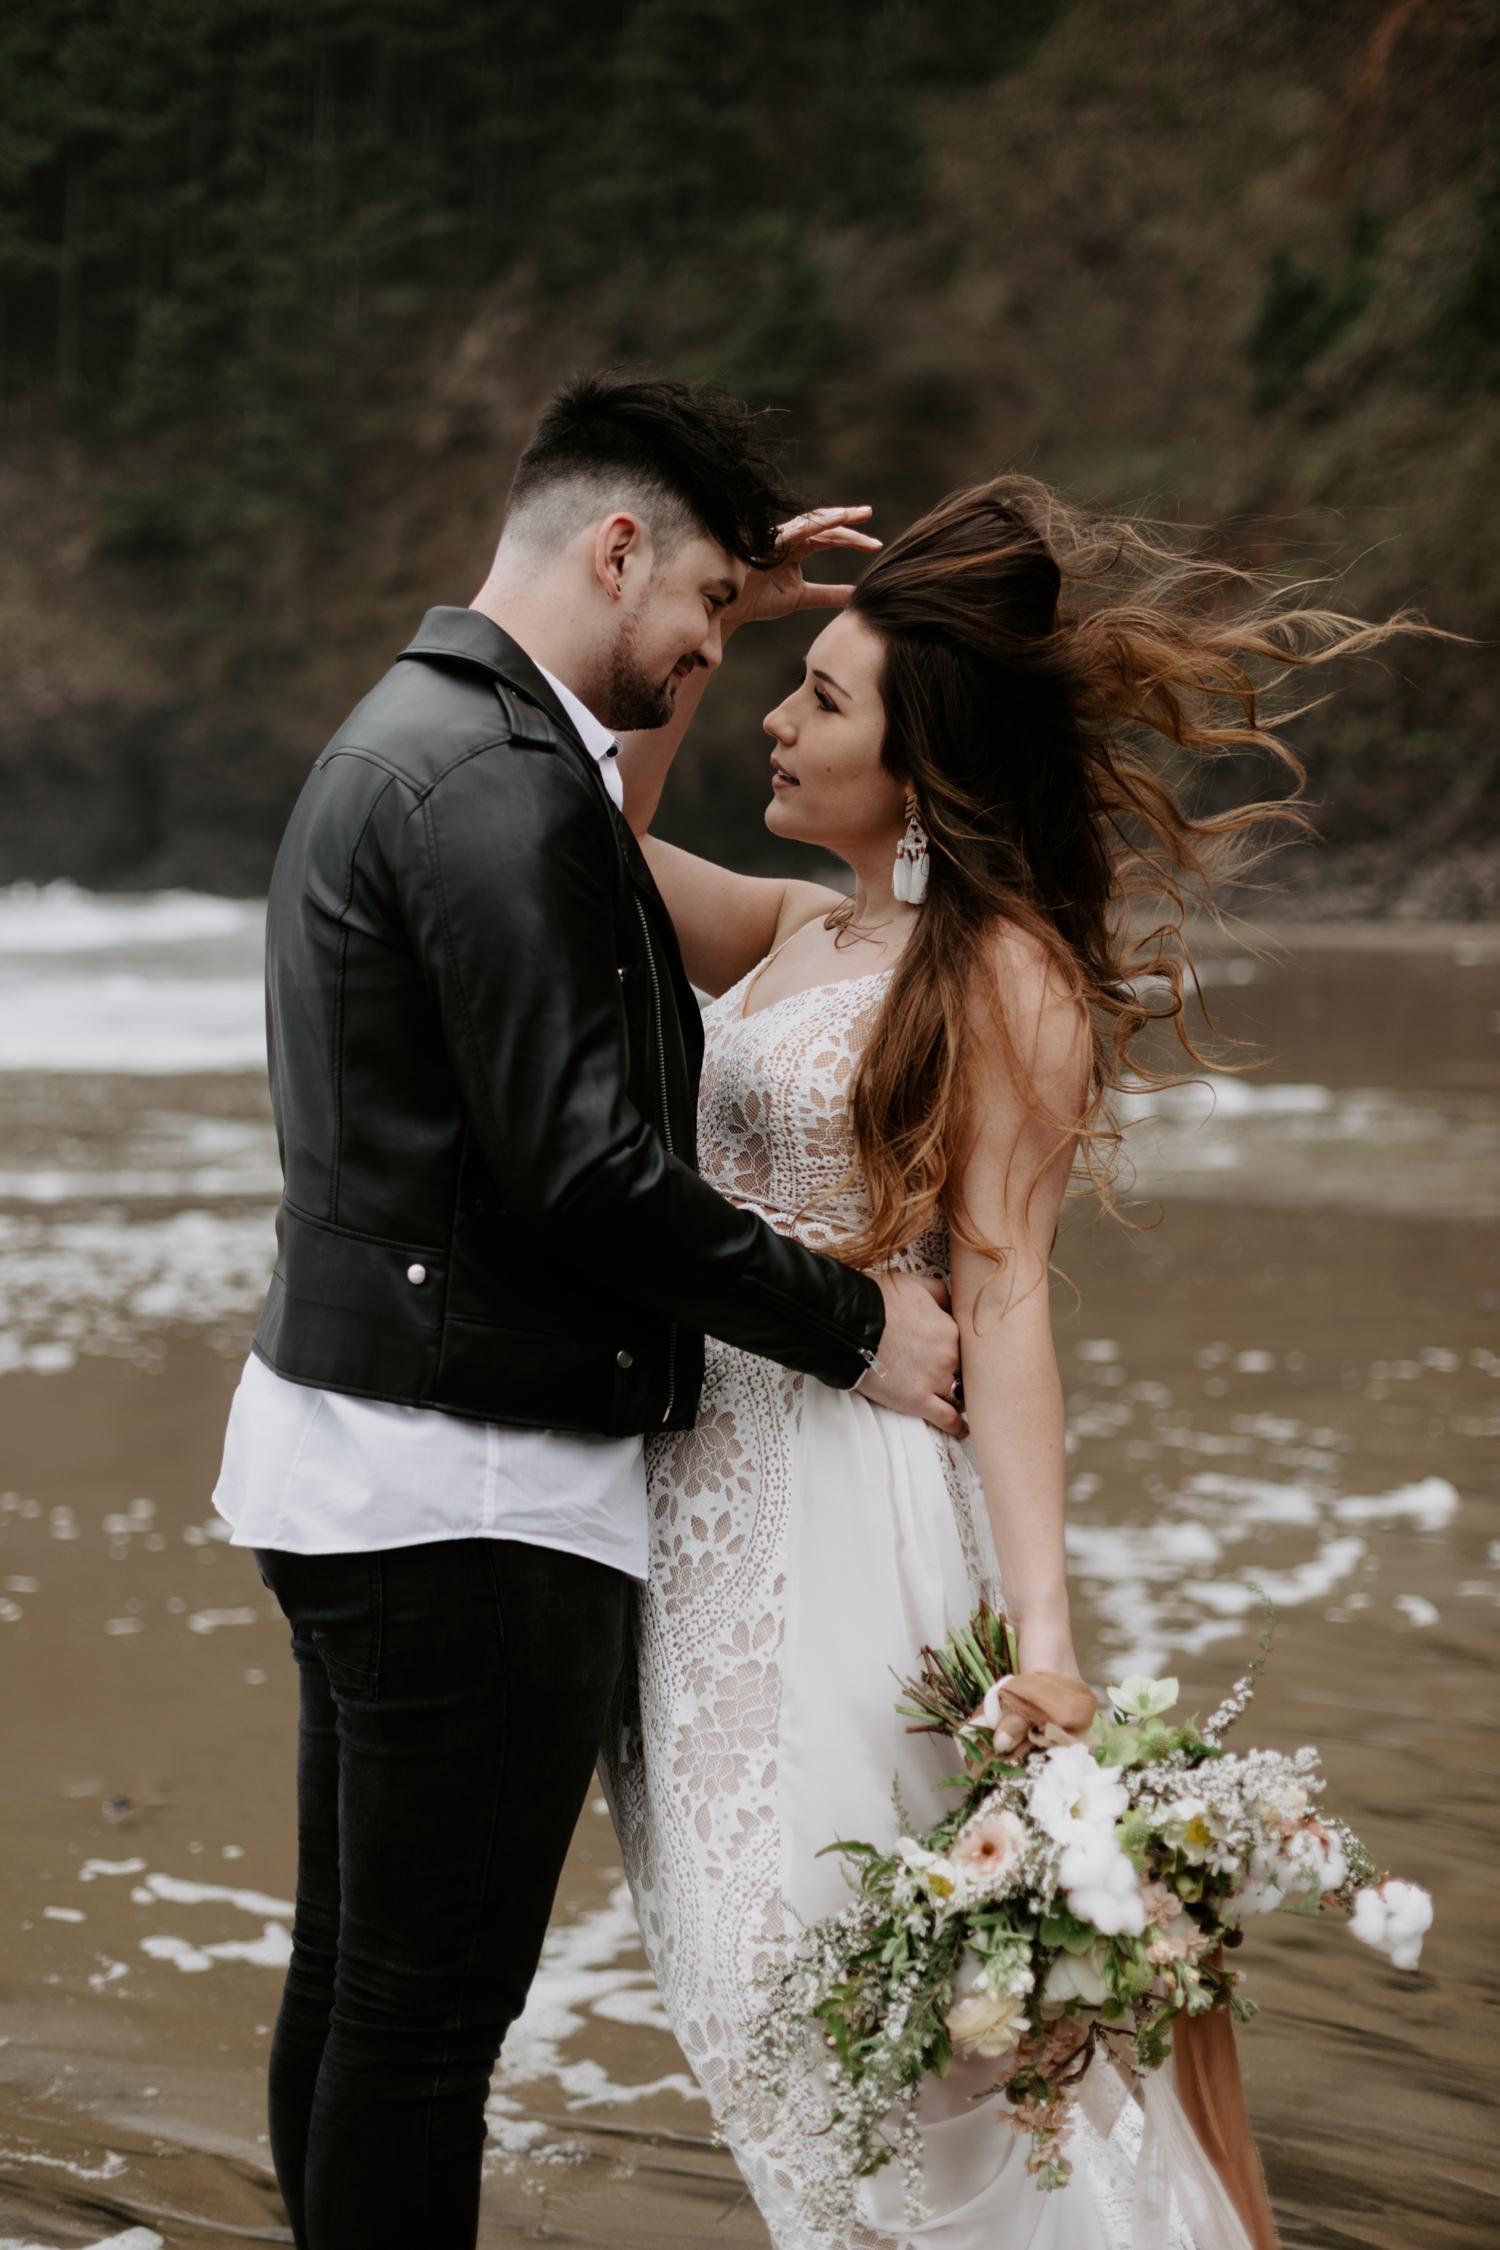 intimate-oregon-coast-elopement-2018-04-26_0005.jpg